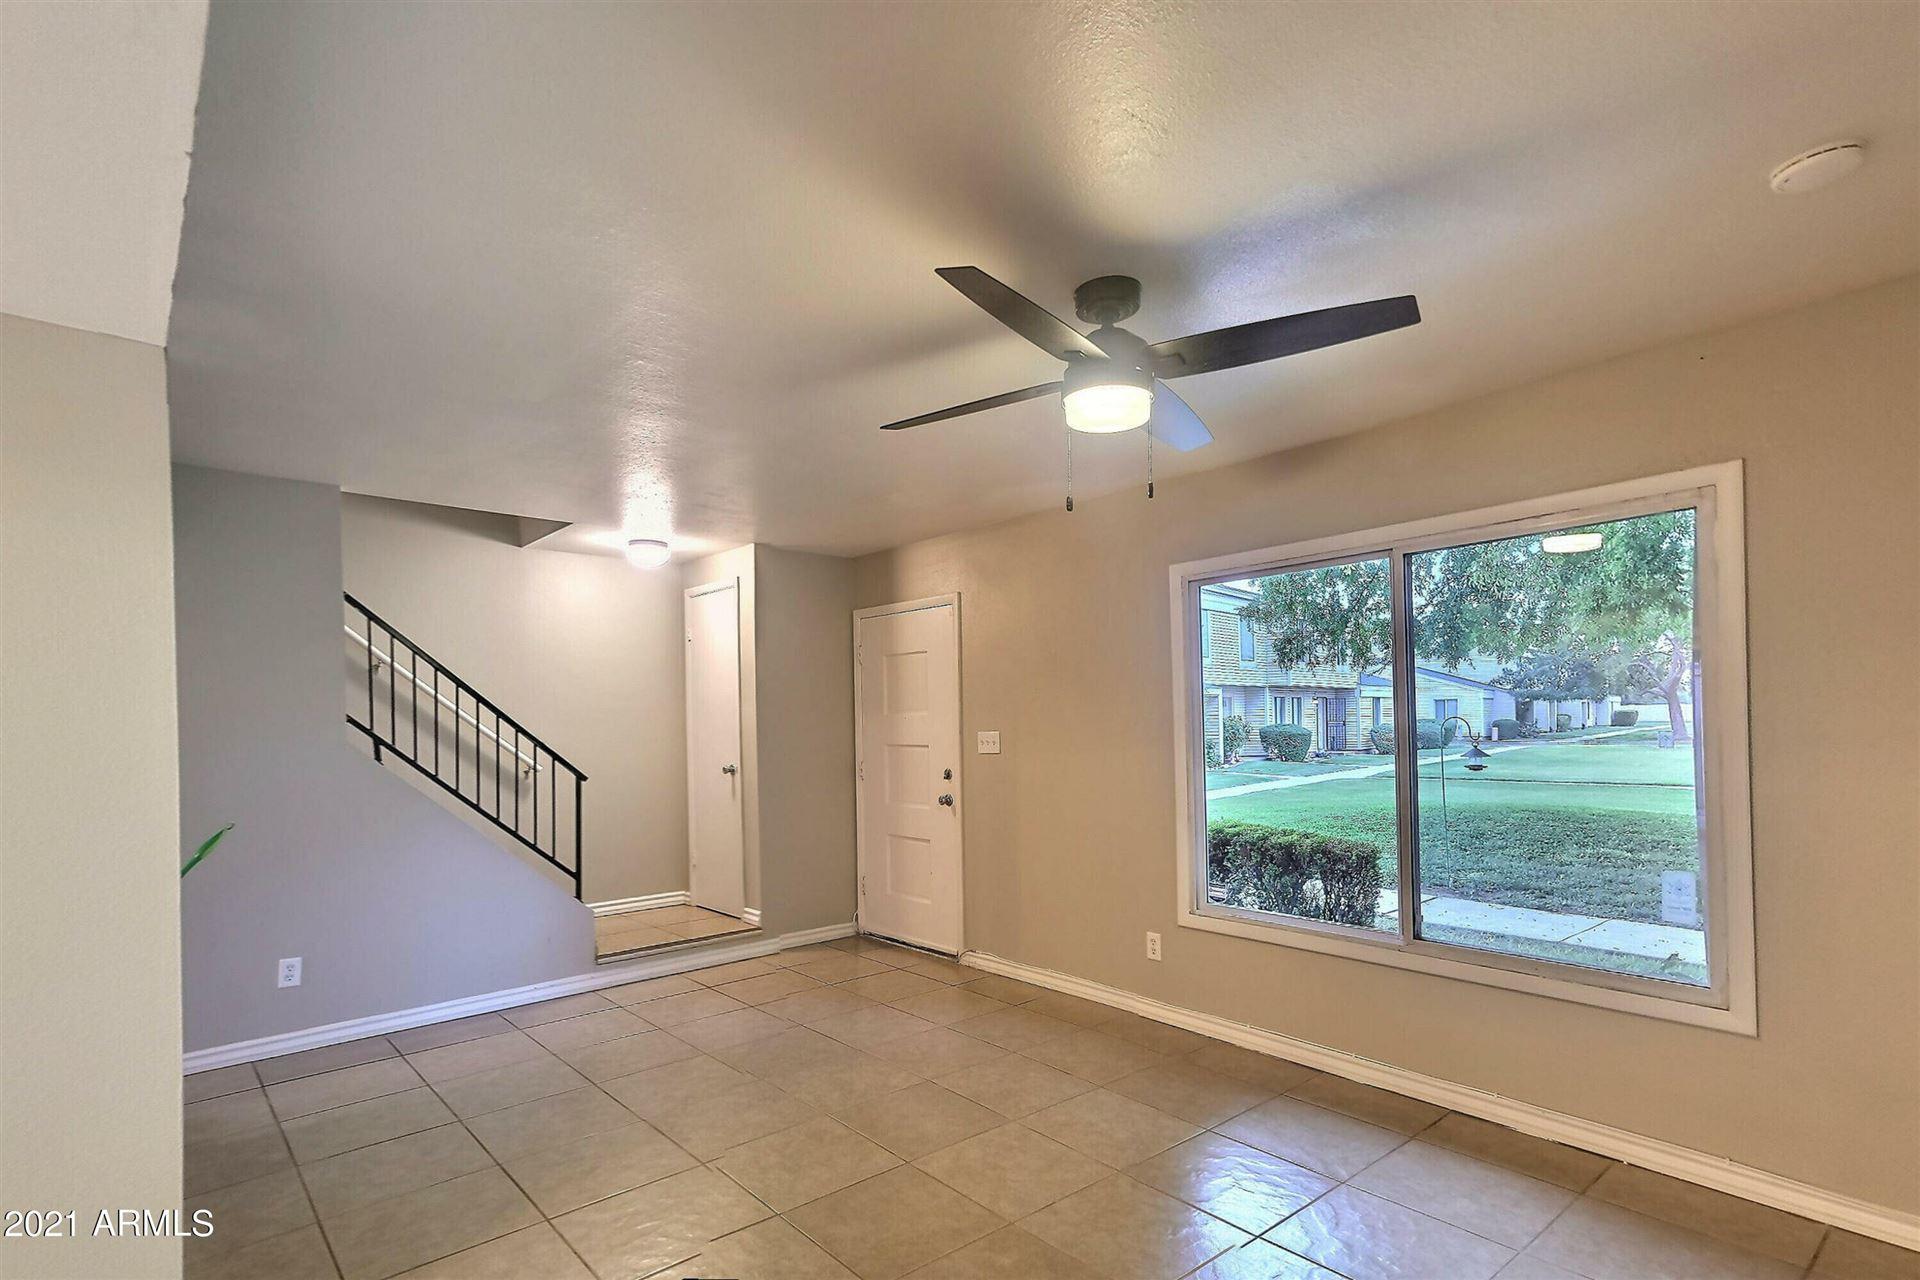 Photo of 410 E WOODMAN Drive, Tempe, AZ 85283 (MLS # 6272695)